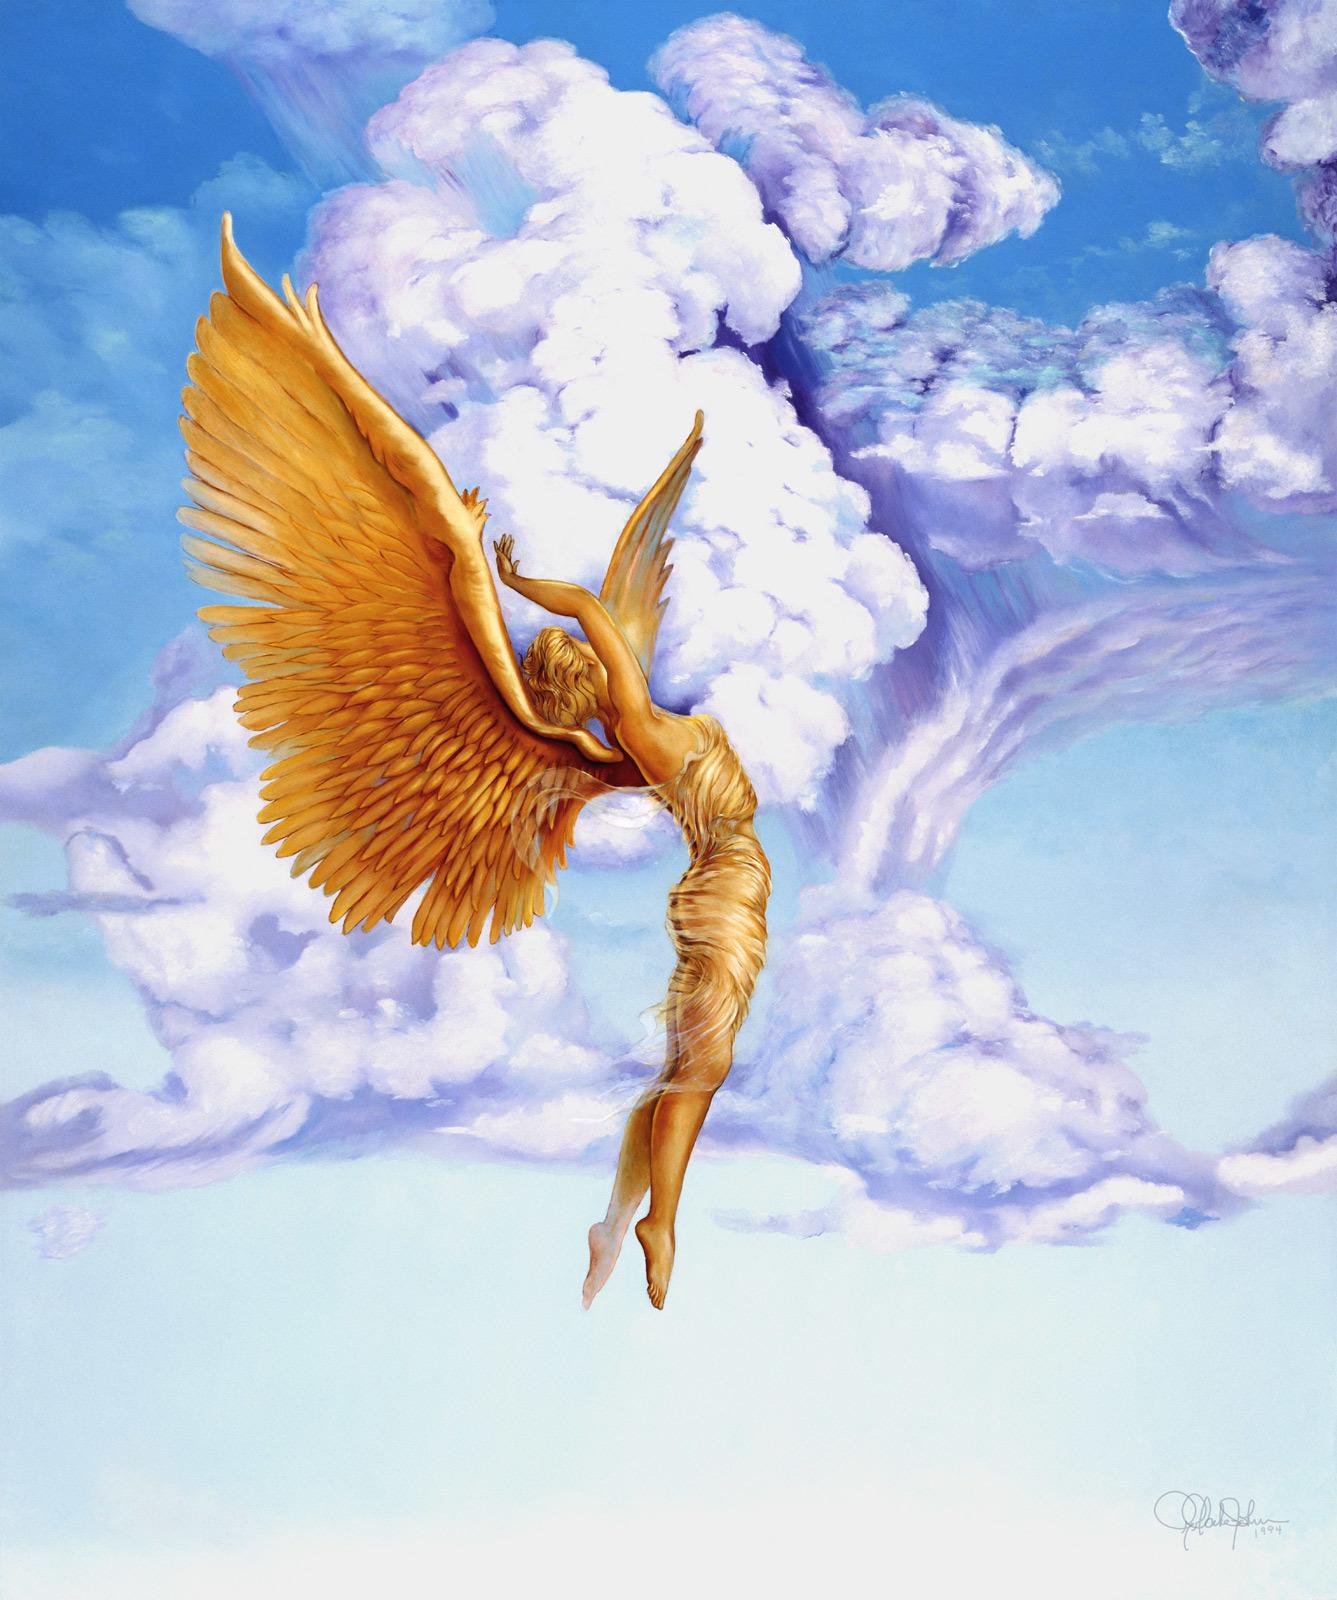 Vedanta divine ecstasy 1 dcfc659f ayn2